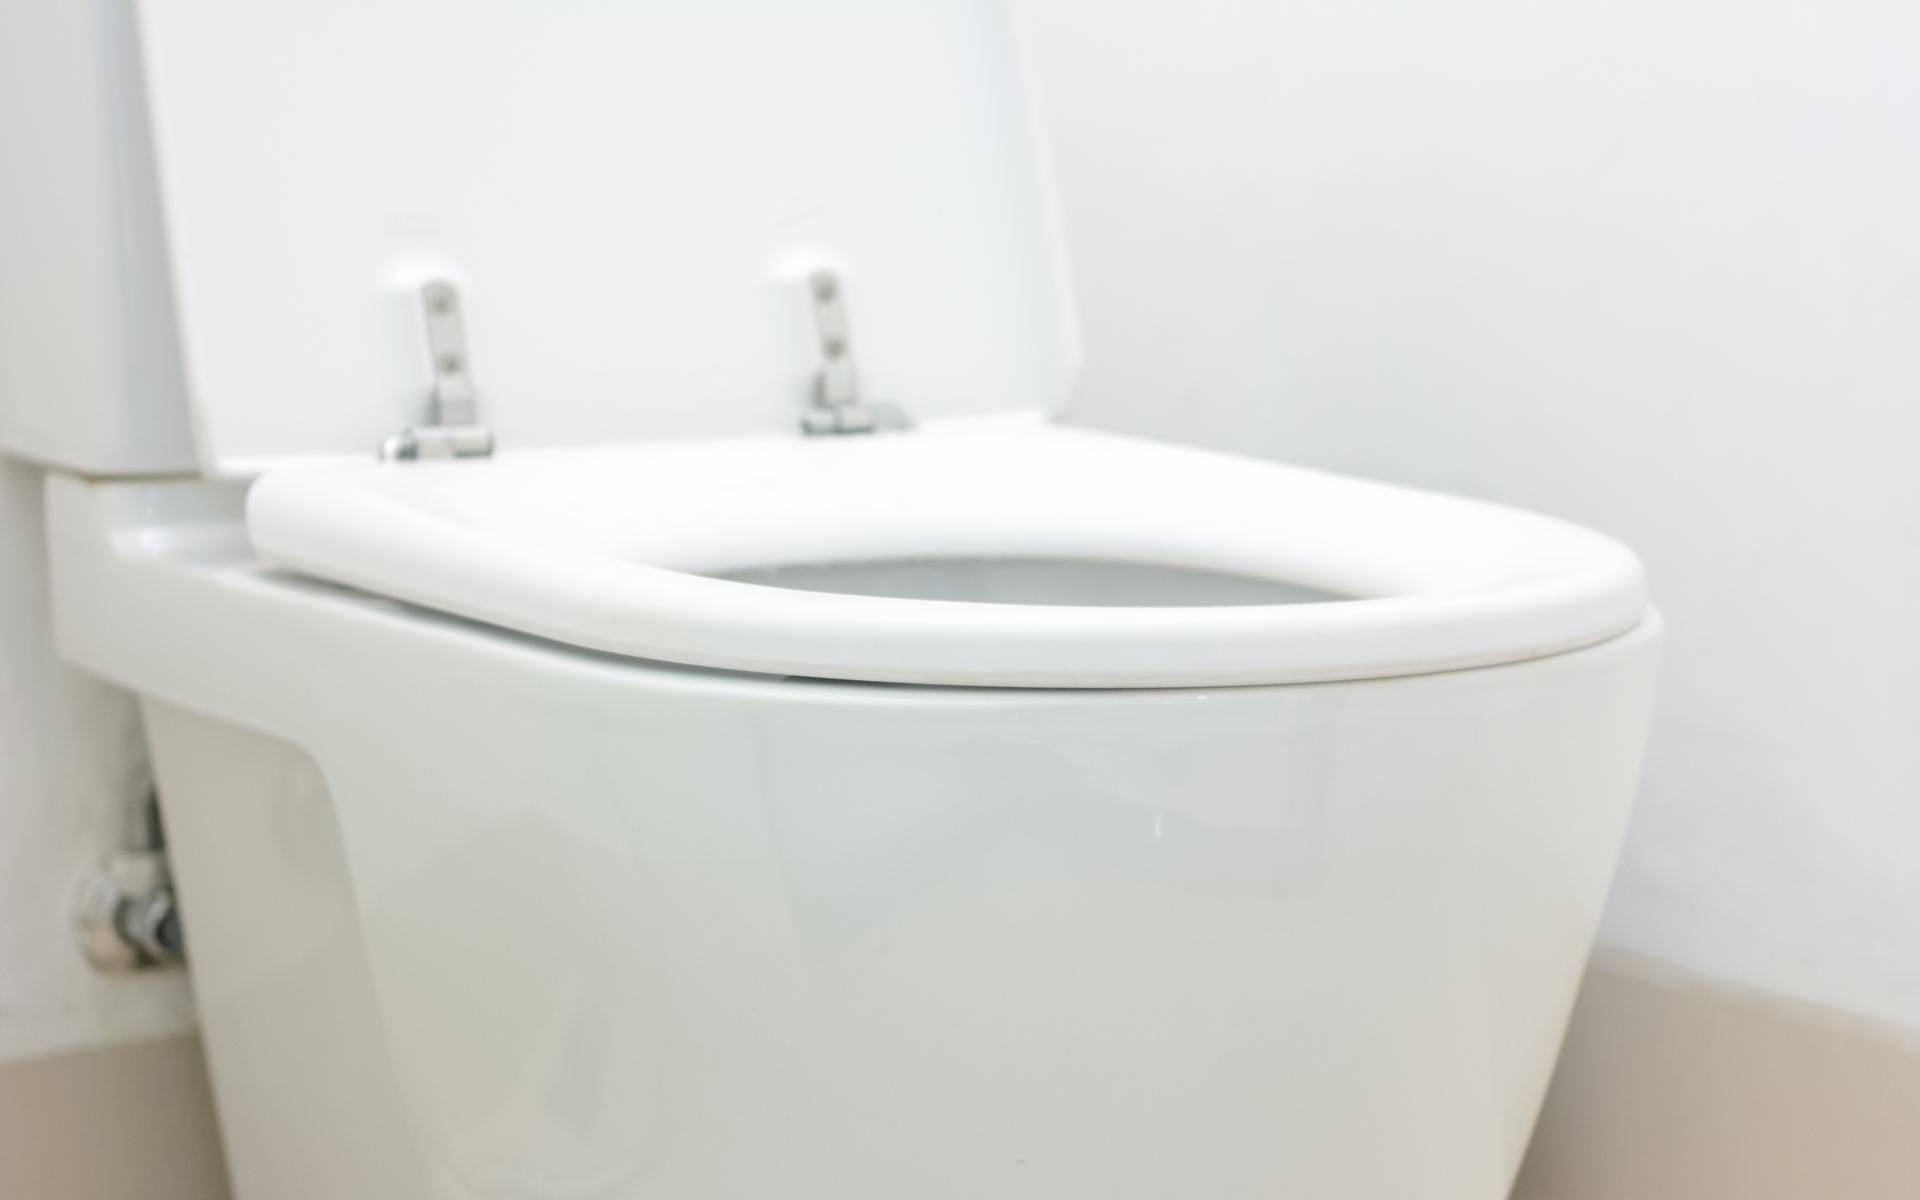 Seminole Toilet Repair